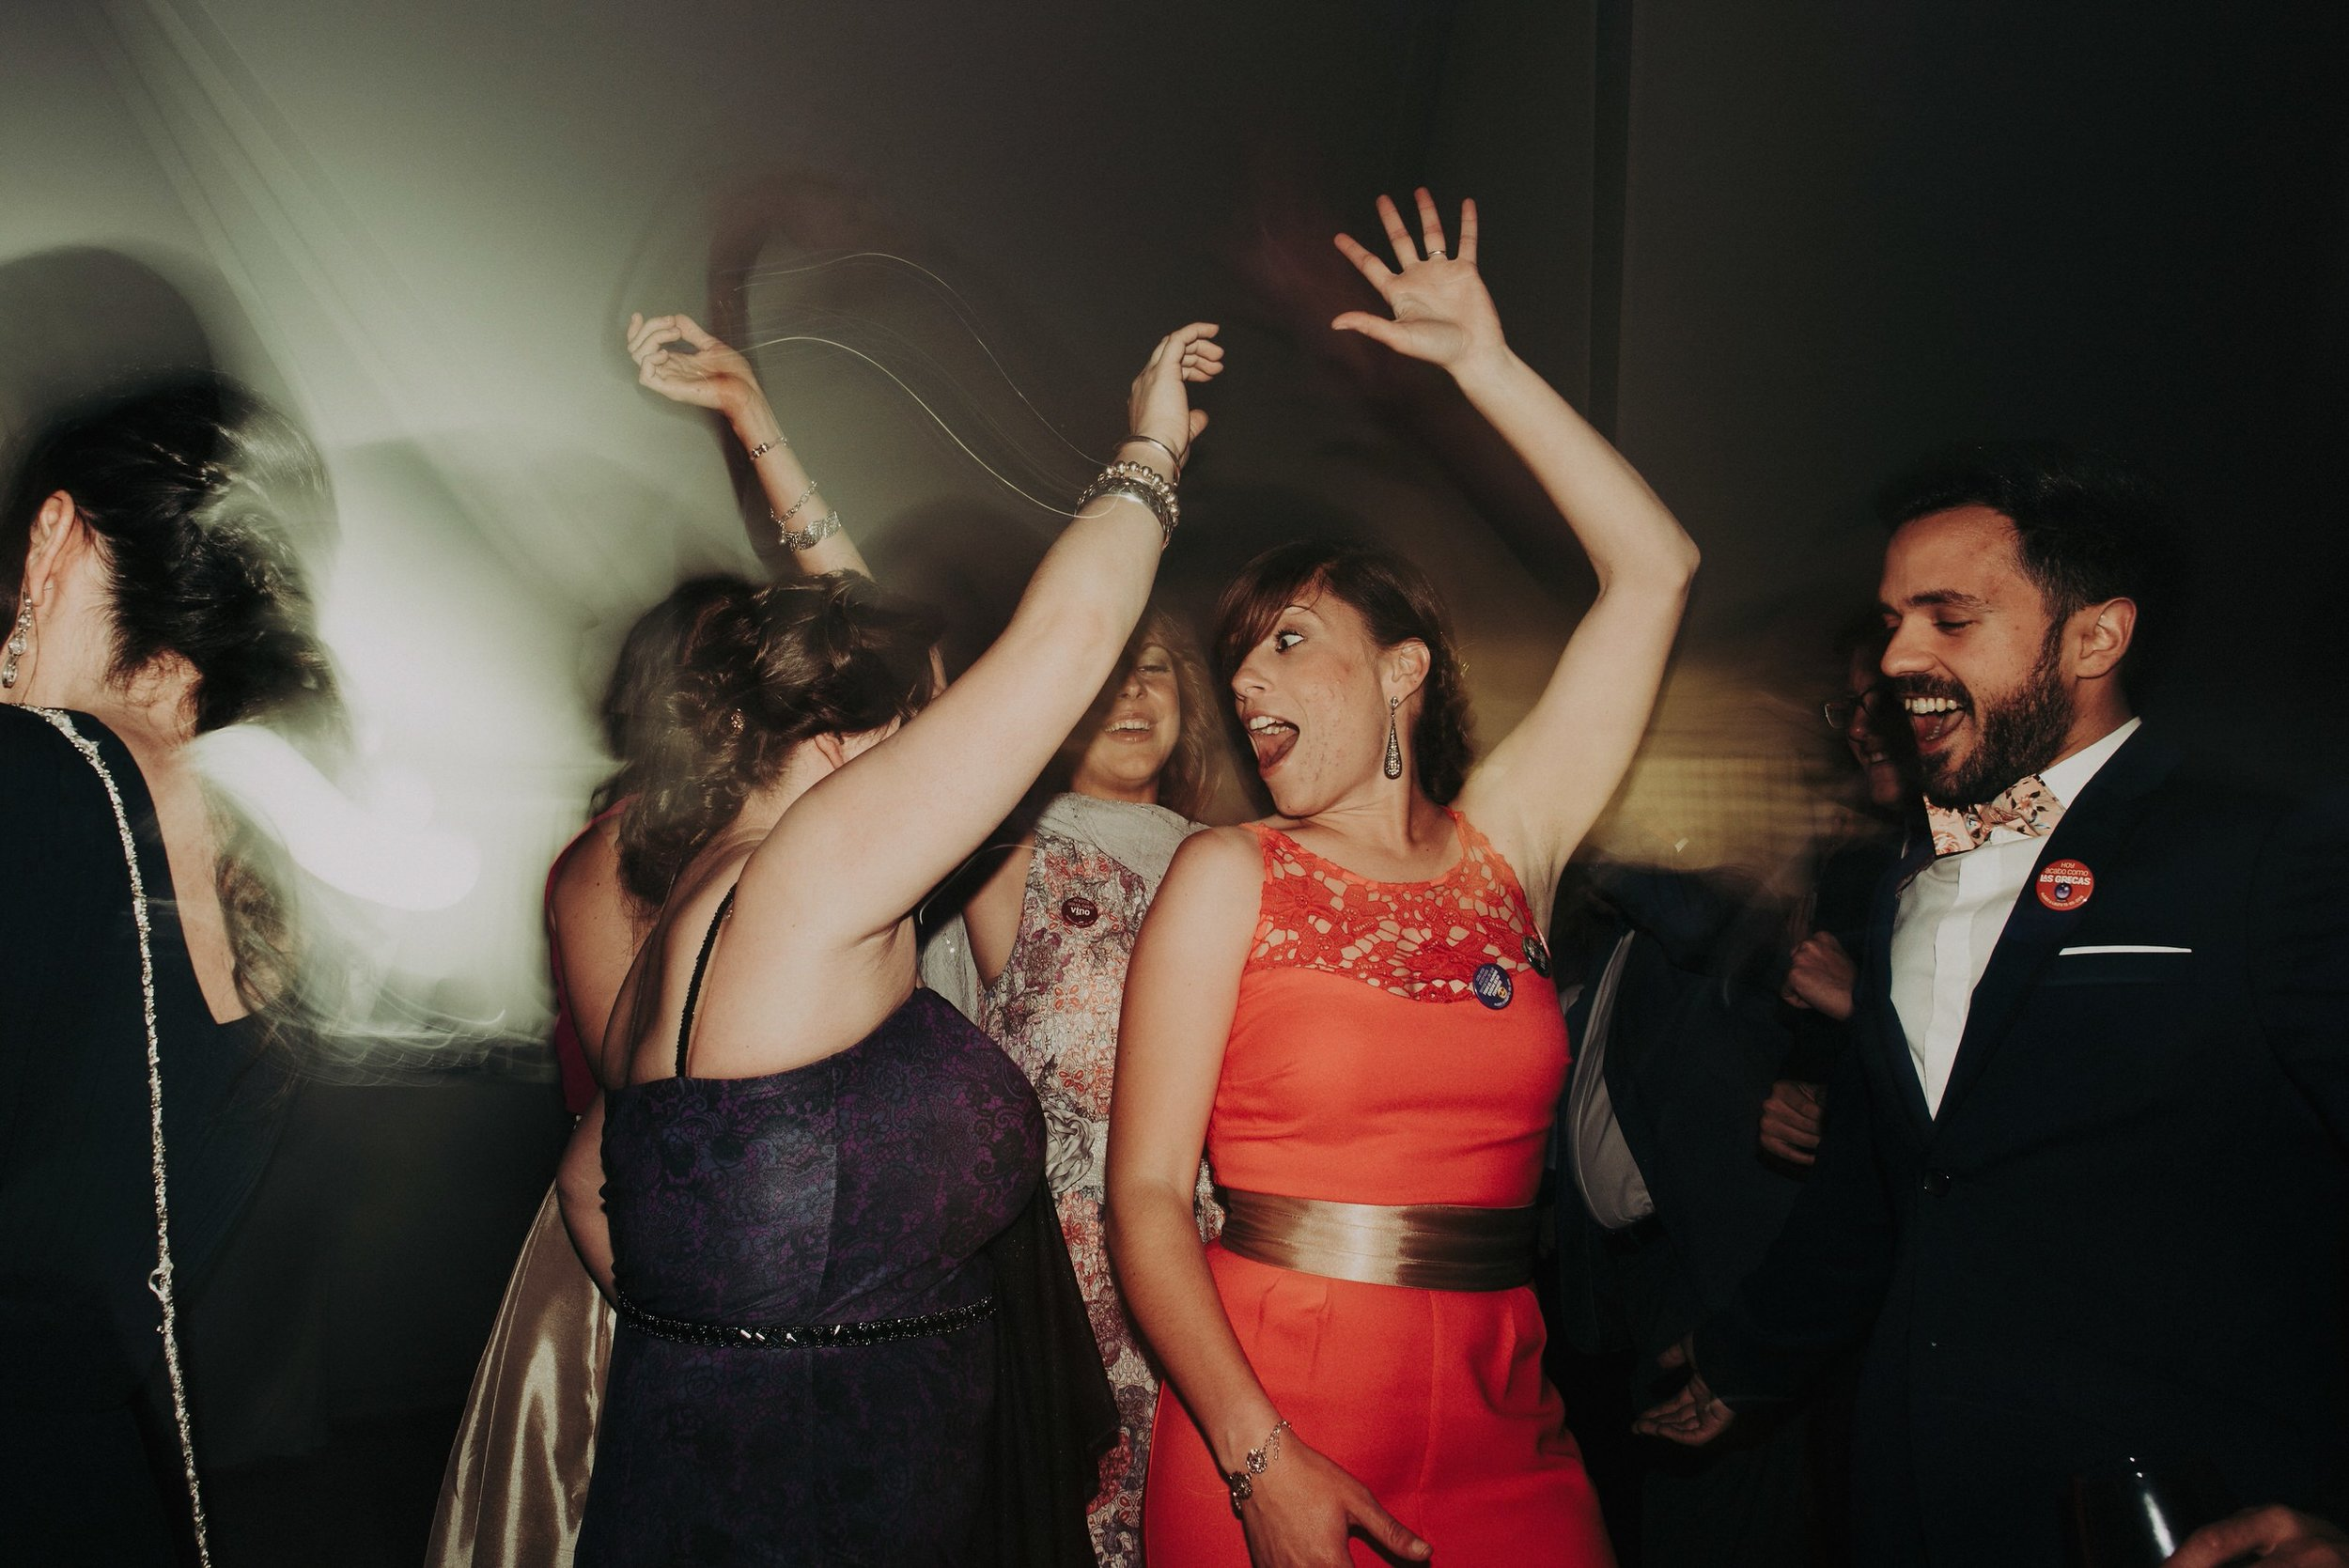 Laura & Rubén - boda en utrera - Santa clotilde- Manolo mayo - Fotografo de boda - Andrés Amarillo AAA_1075-Exposure (45).jpg